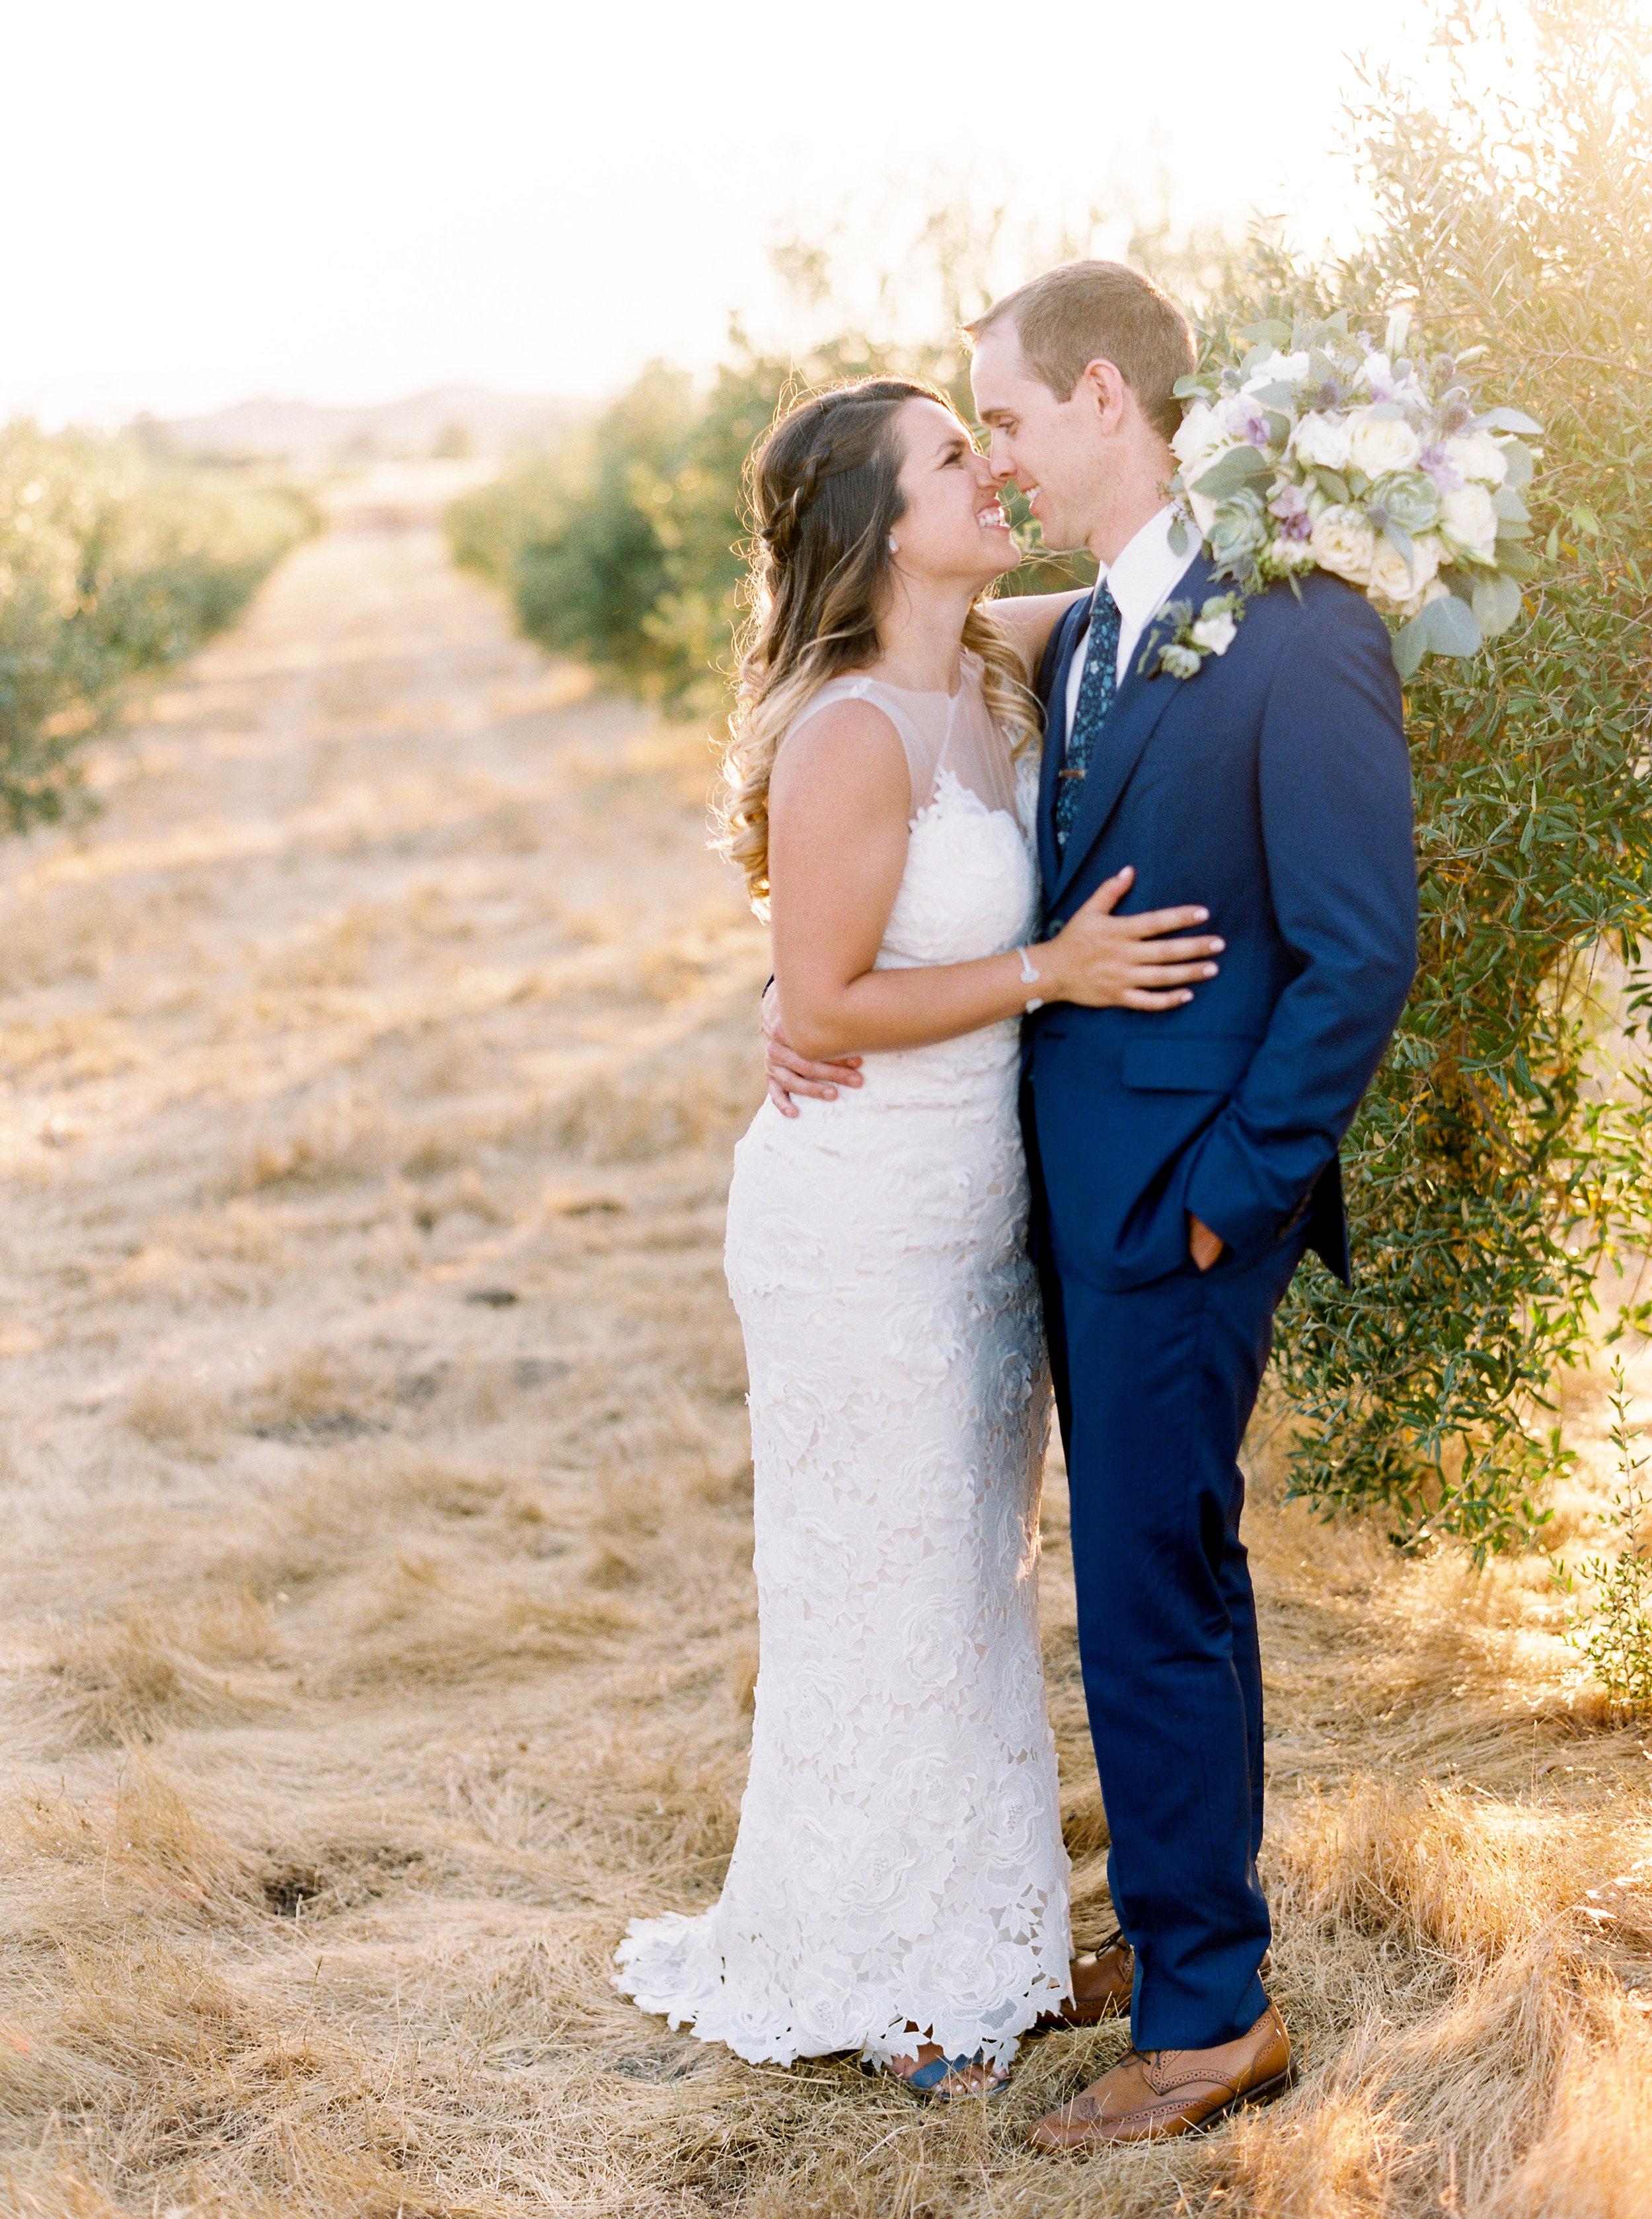 the-purple-orchid-resort-wedding-in-livermore-california-178.jpg